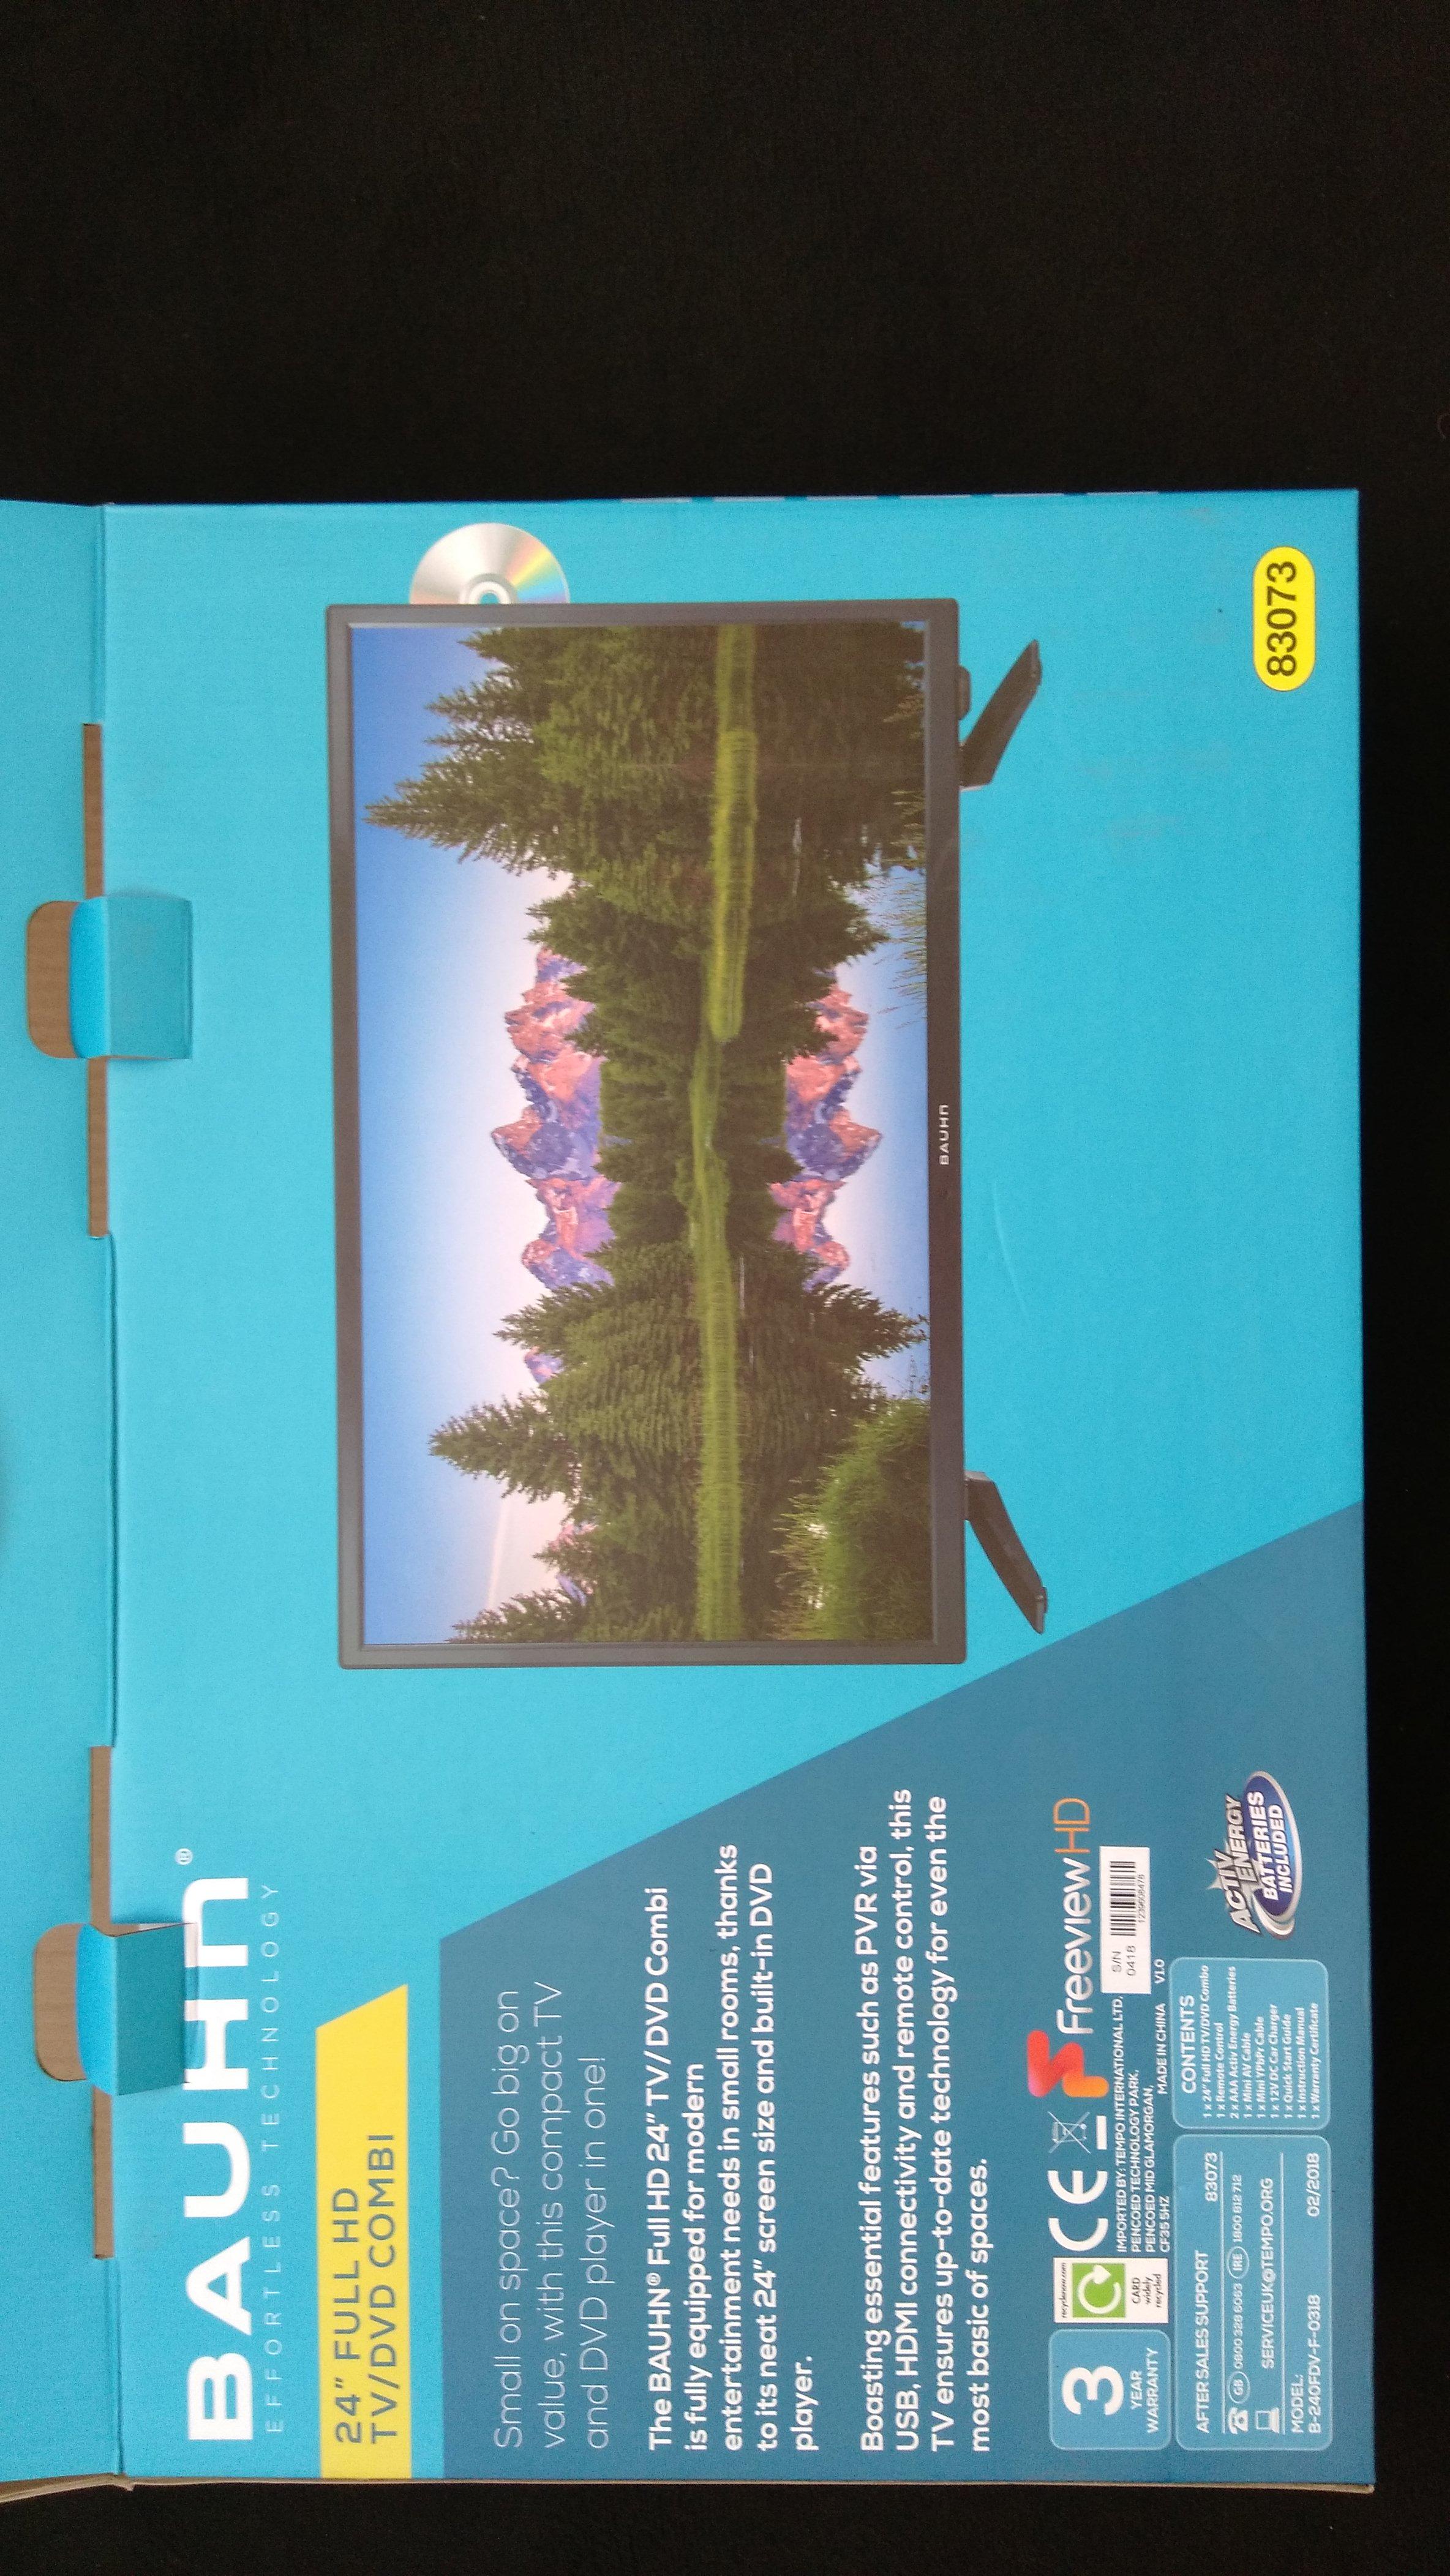 "Aldi stores 24"" TV/DVD/USB etc - £59.99 (found instore - Cheadle Heath)"